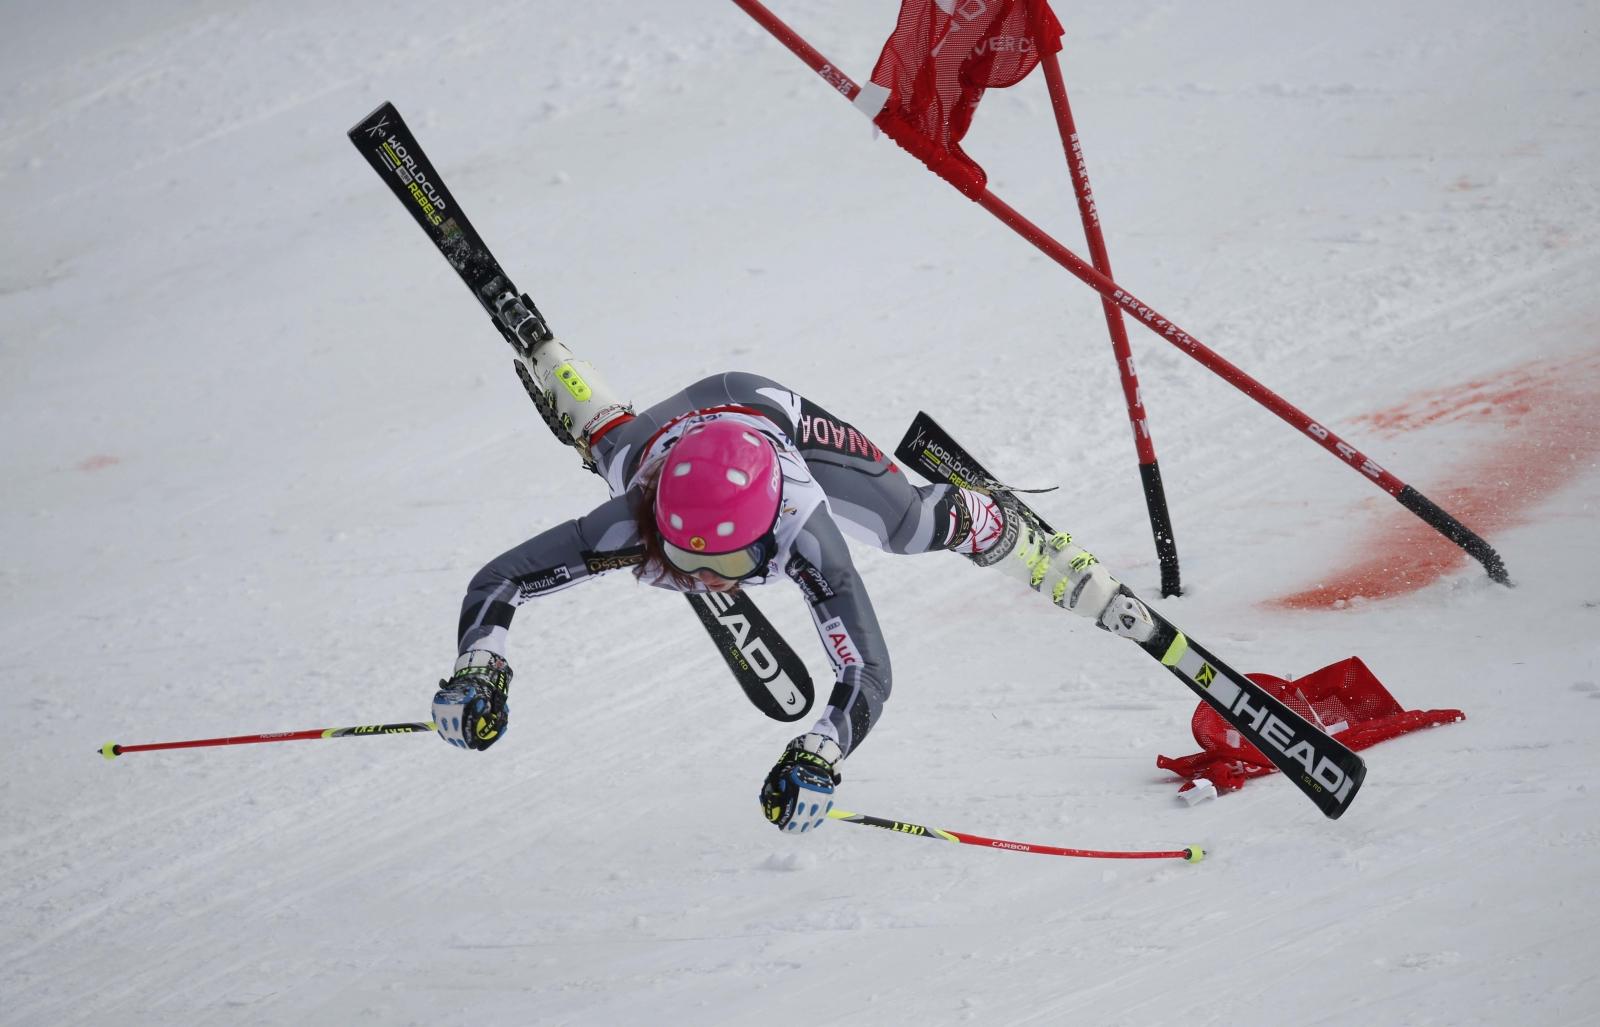 Ski accident